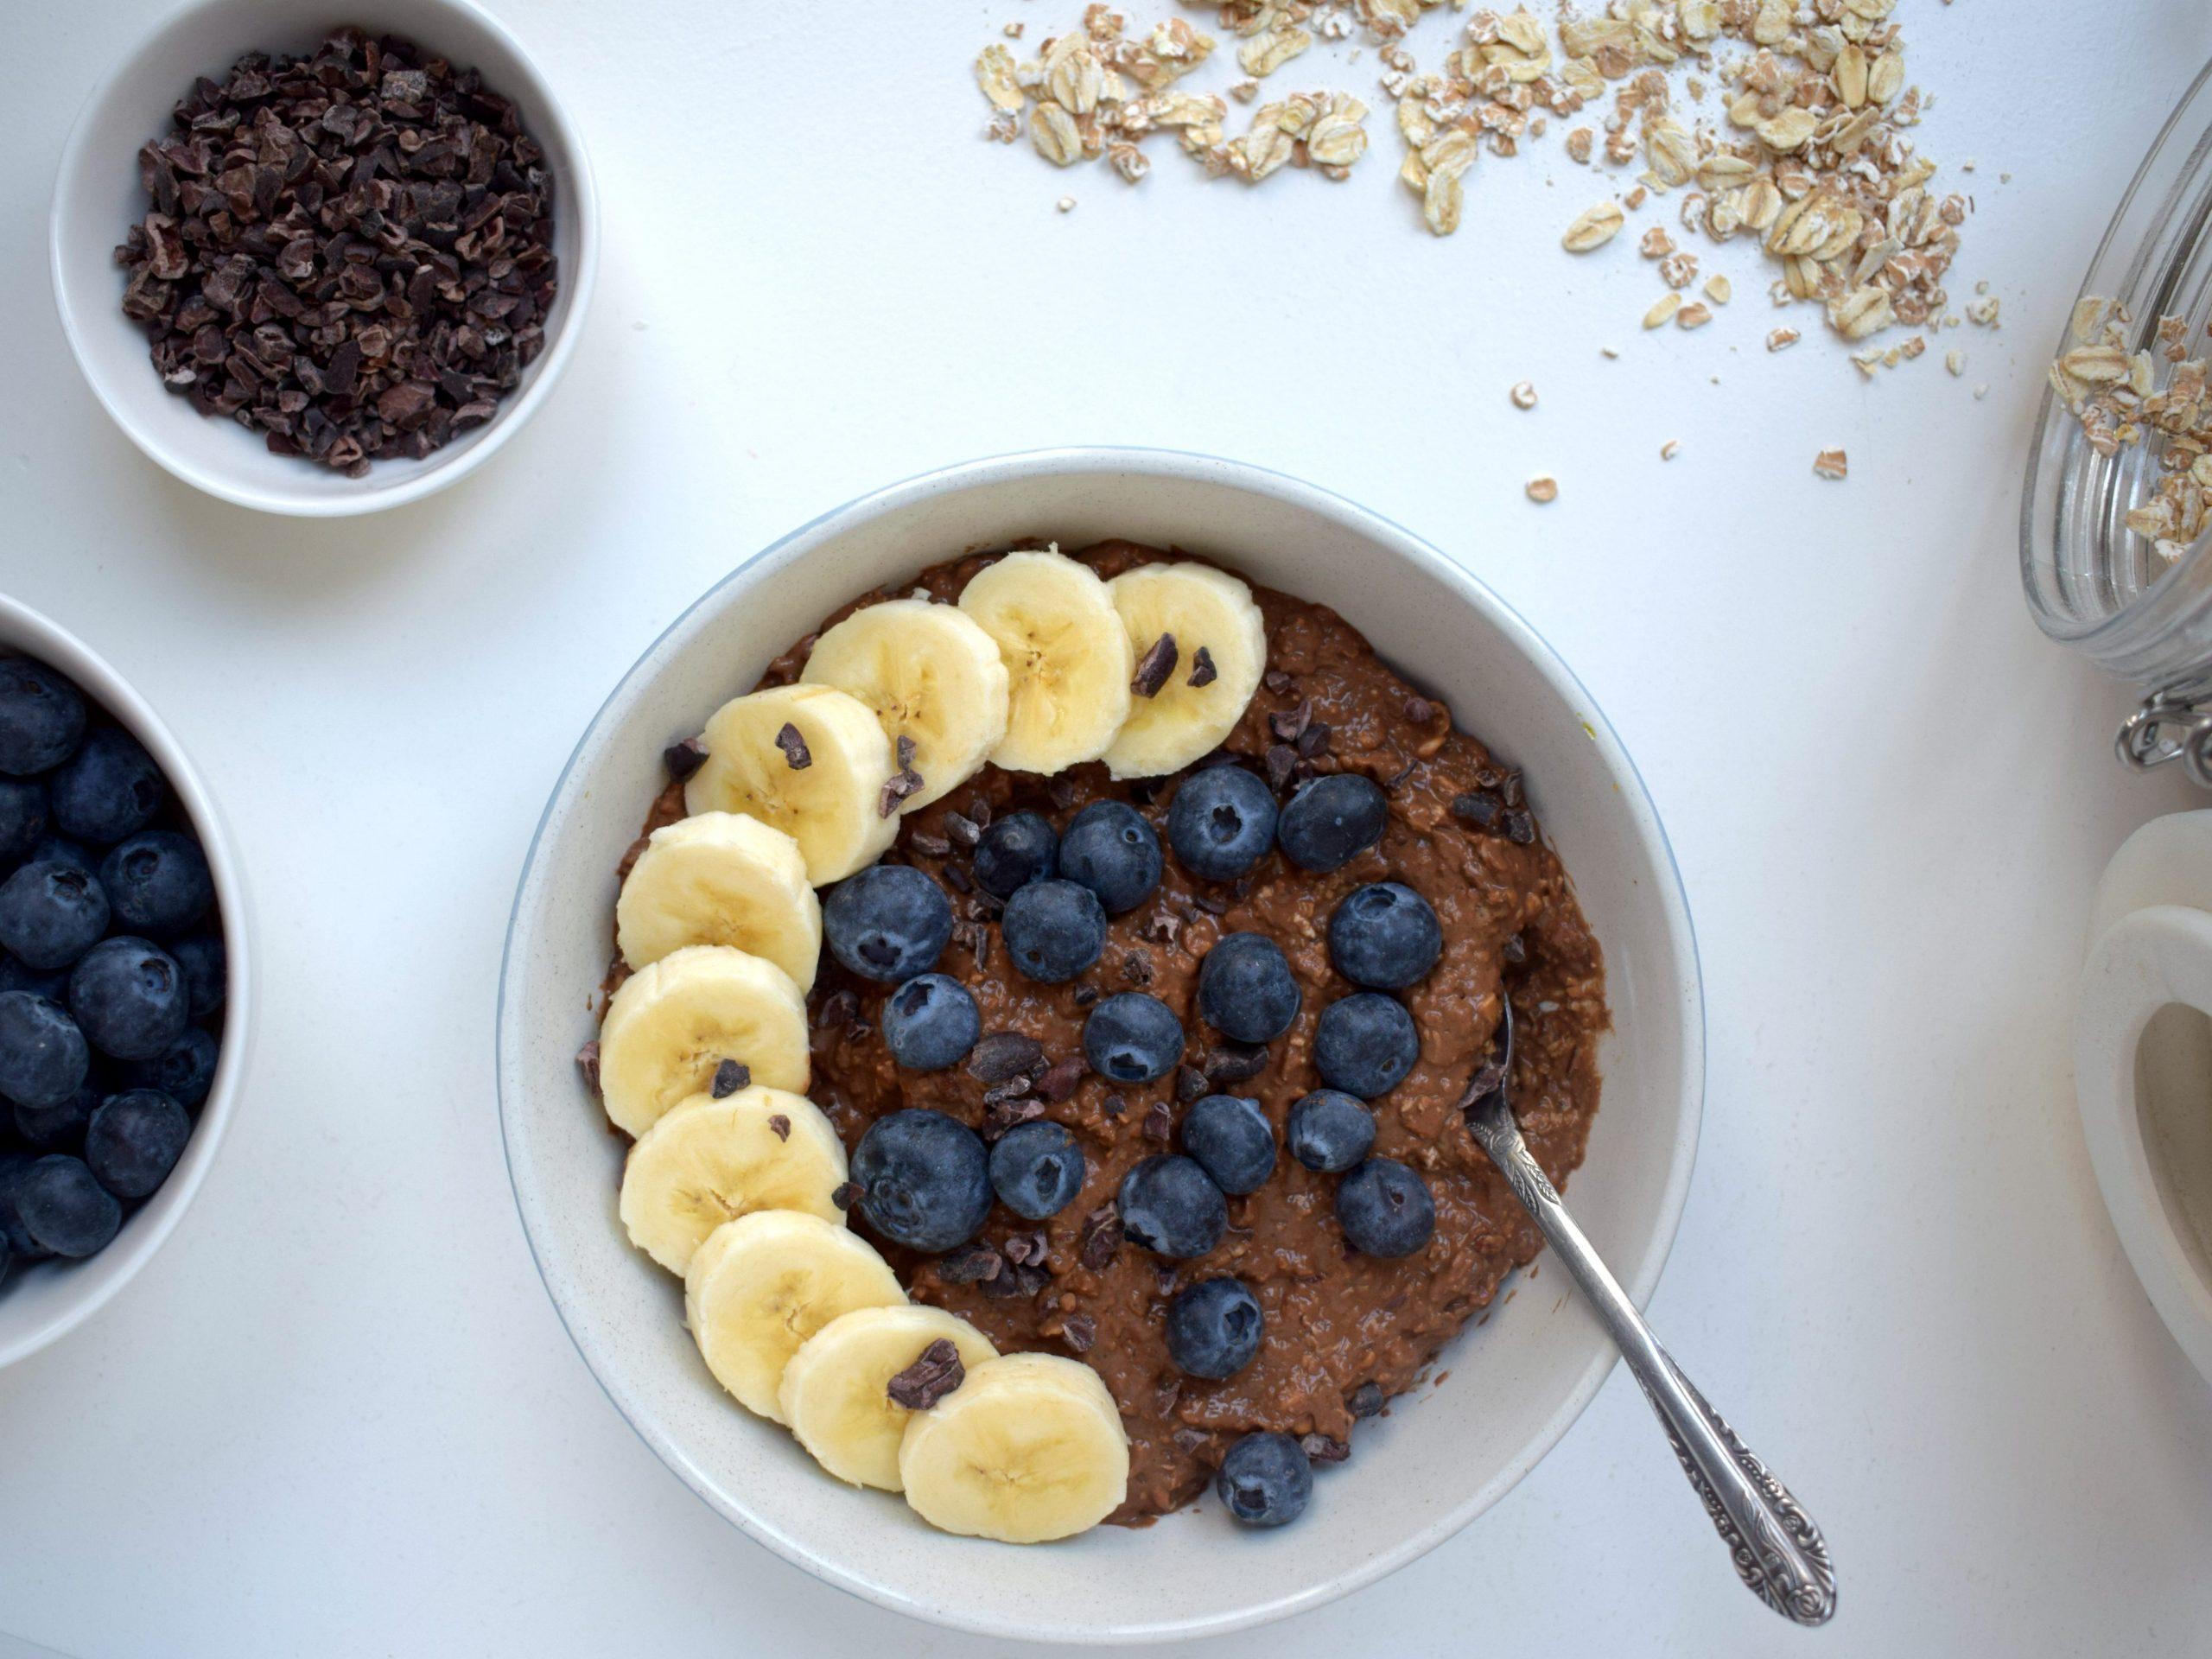 Chocolade havermout ontbijt (eiwitrijk)